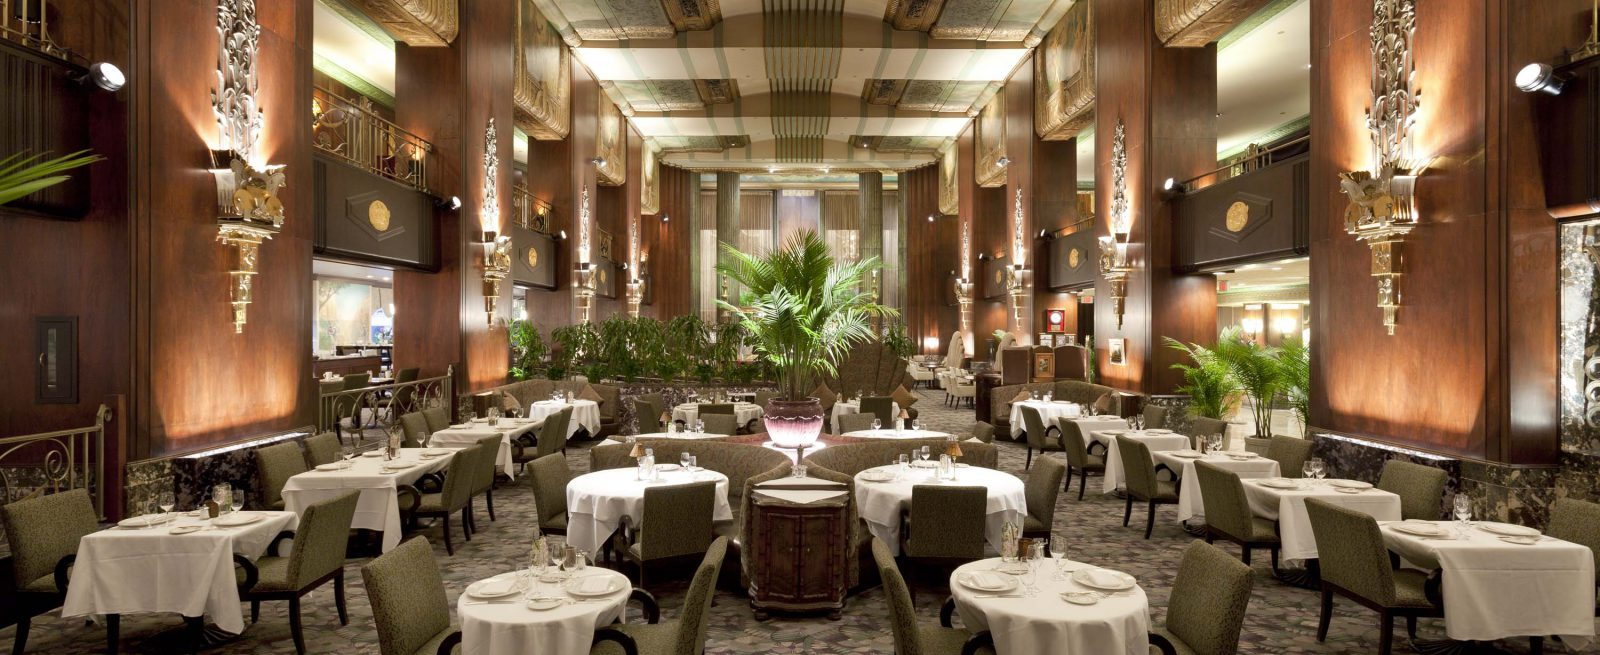 Mrm News Bites Remembering A Restaurant Industry Legend